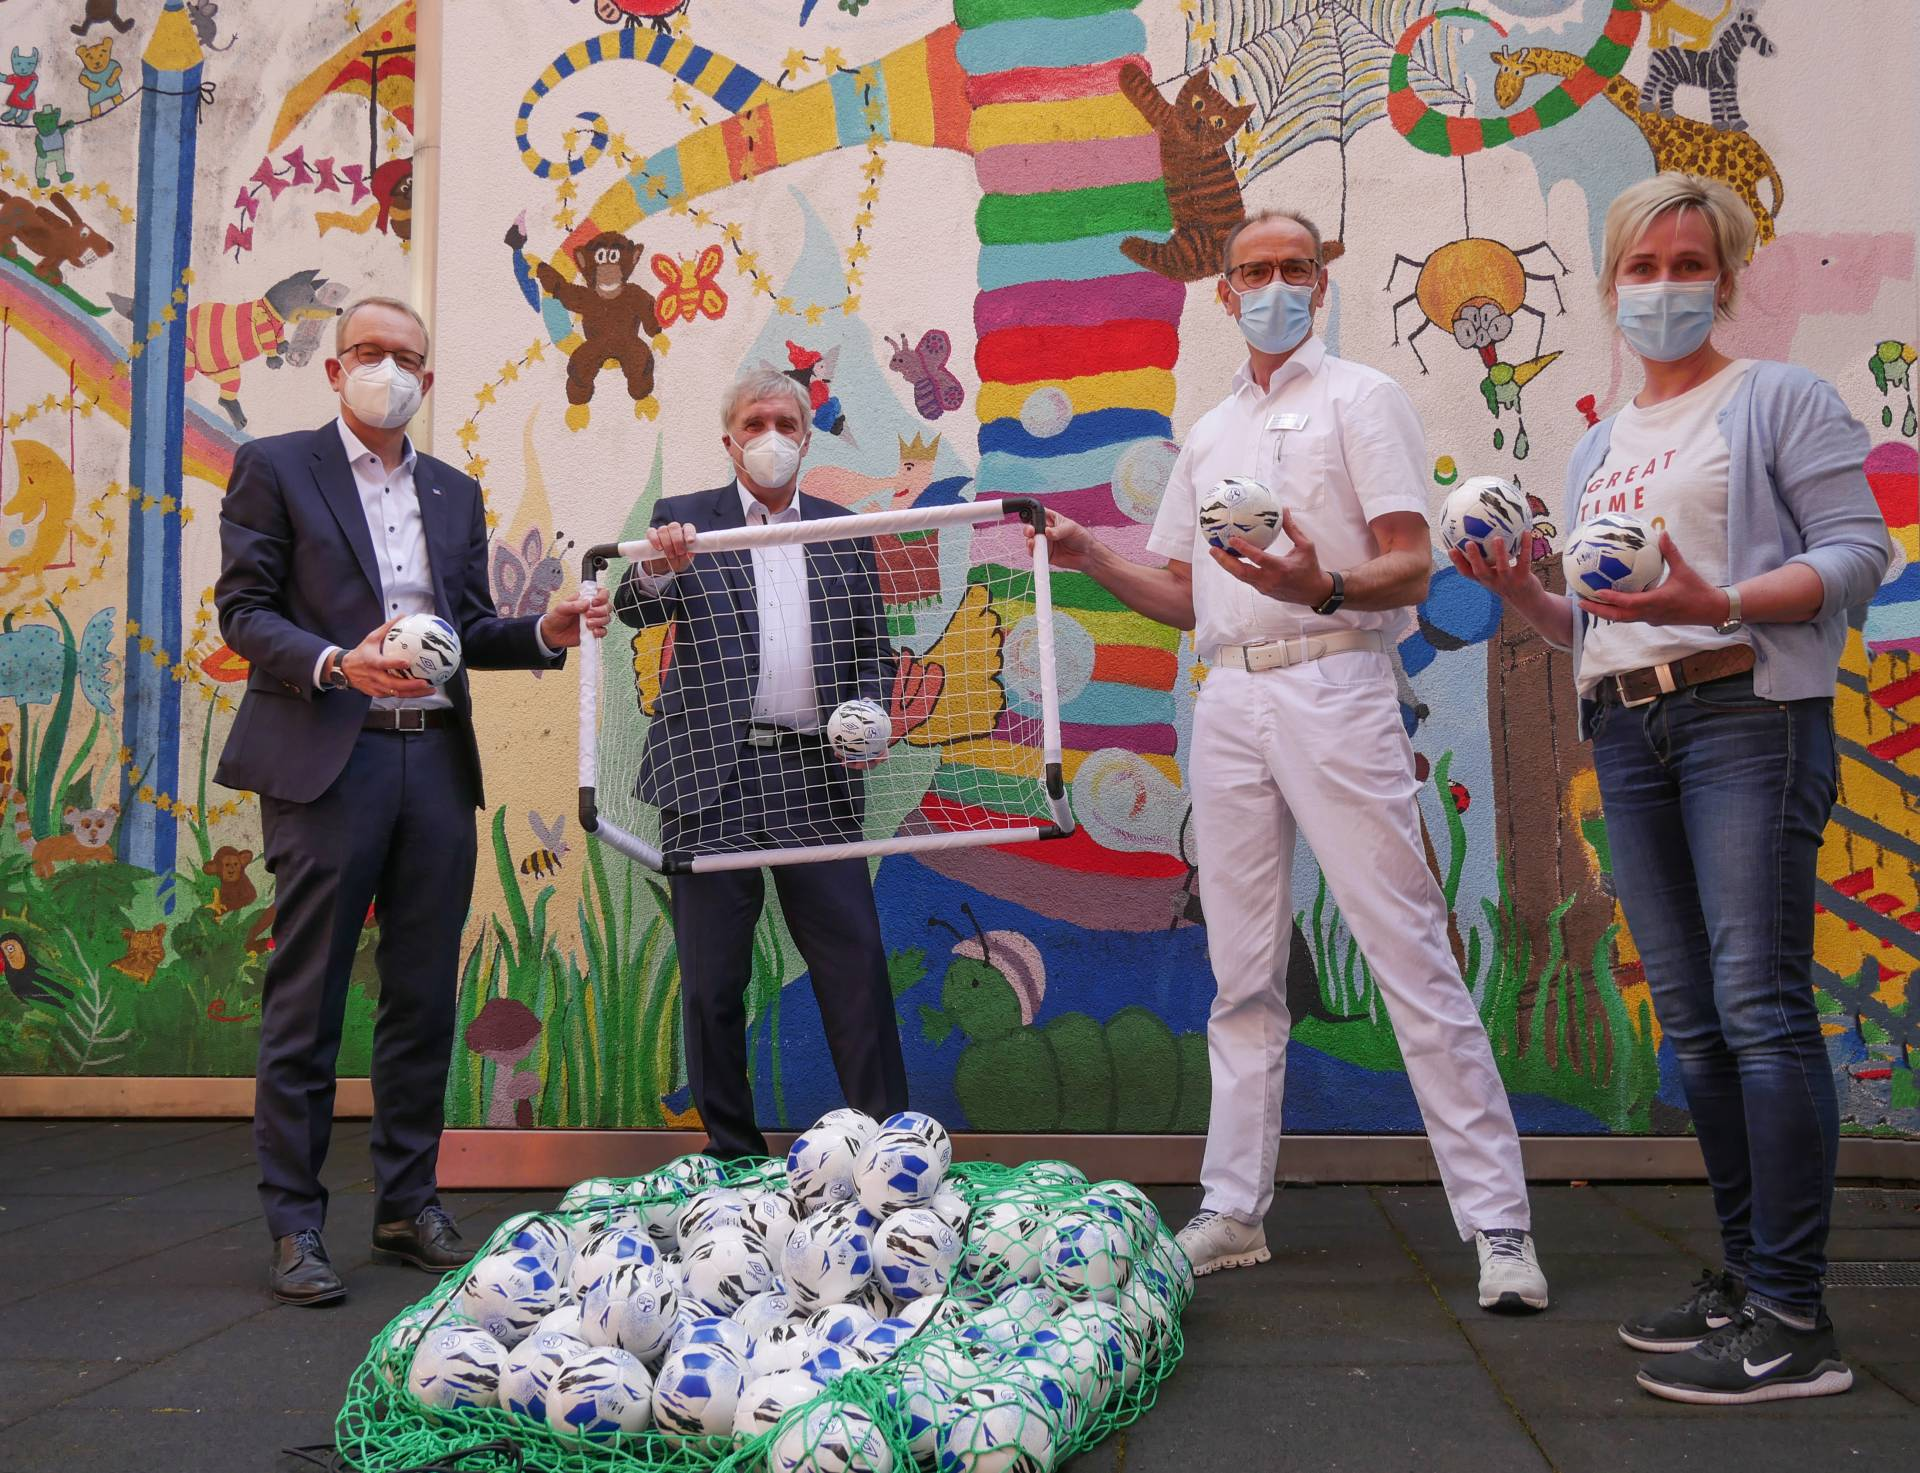 Christophorus Kliniken Kinder- und Jugendmedizin Spende der VR-Bank Westmuensterland Schalnke 04 Fußbaelle